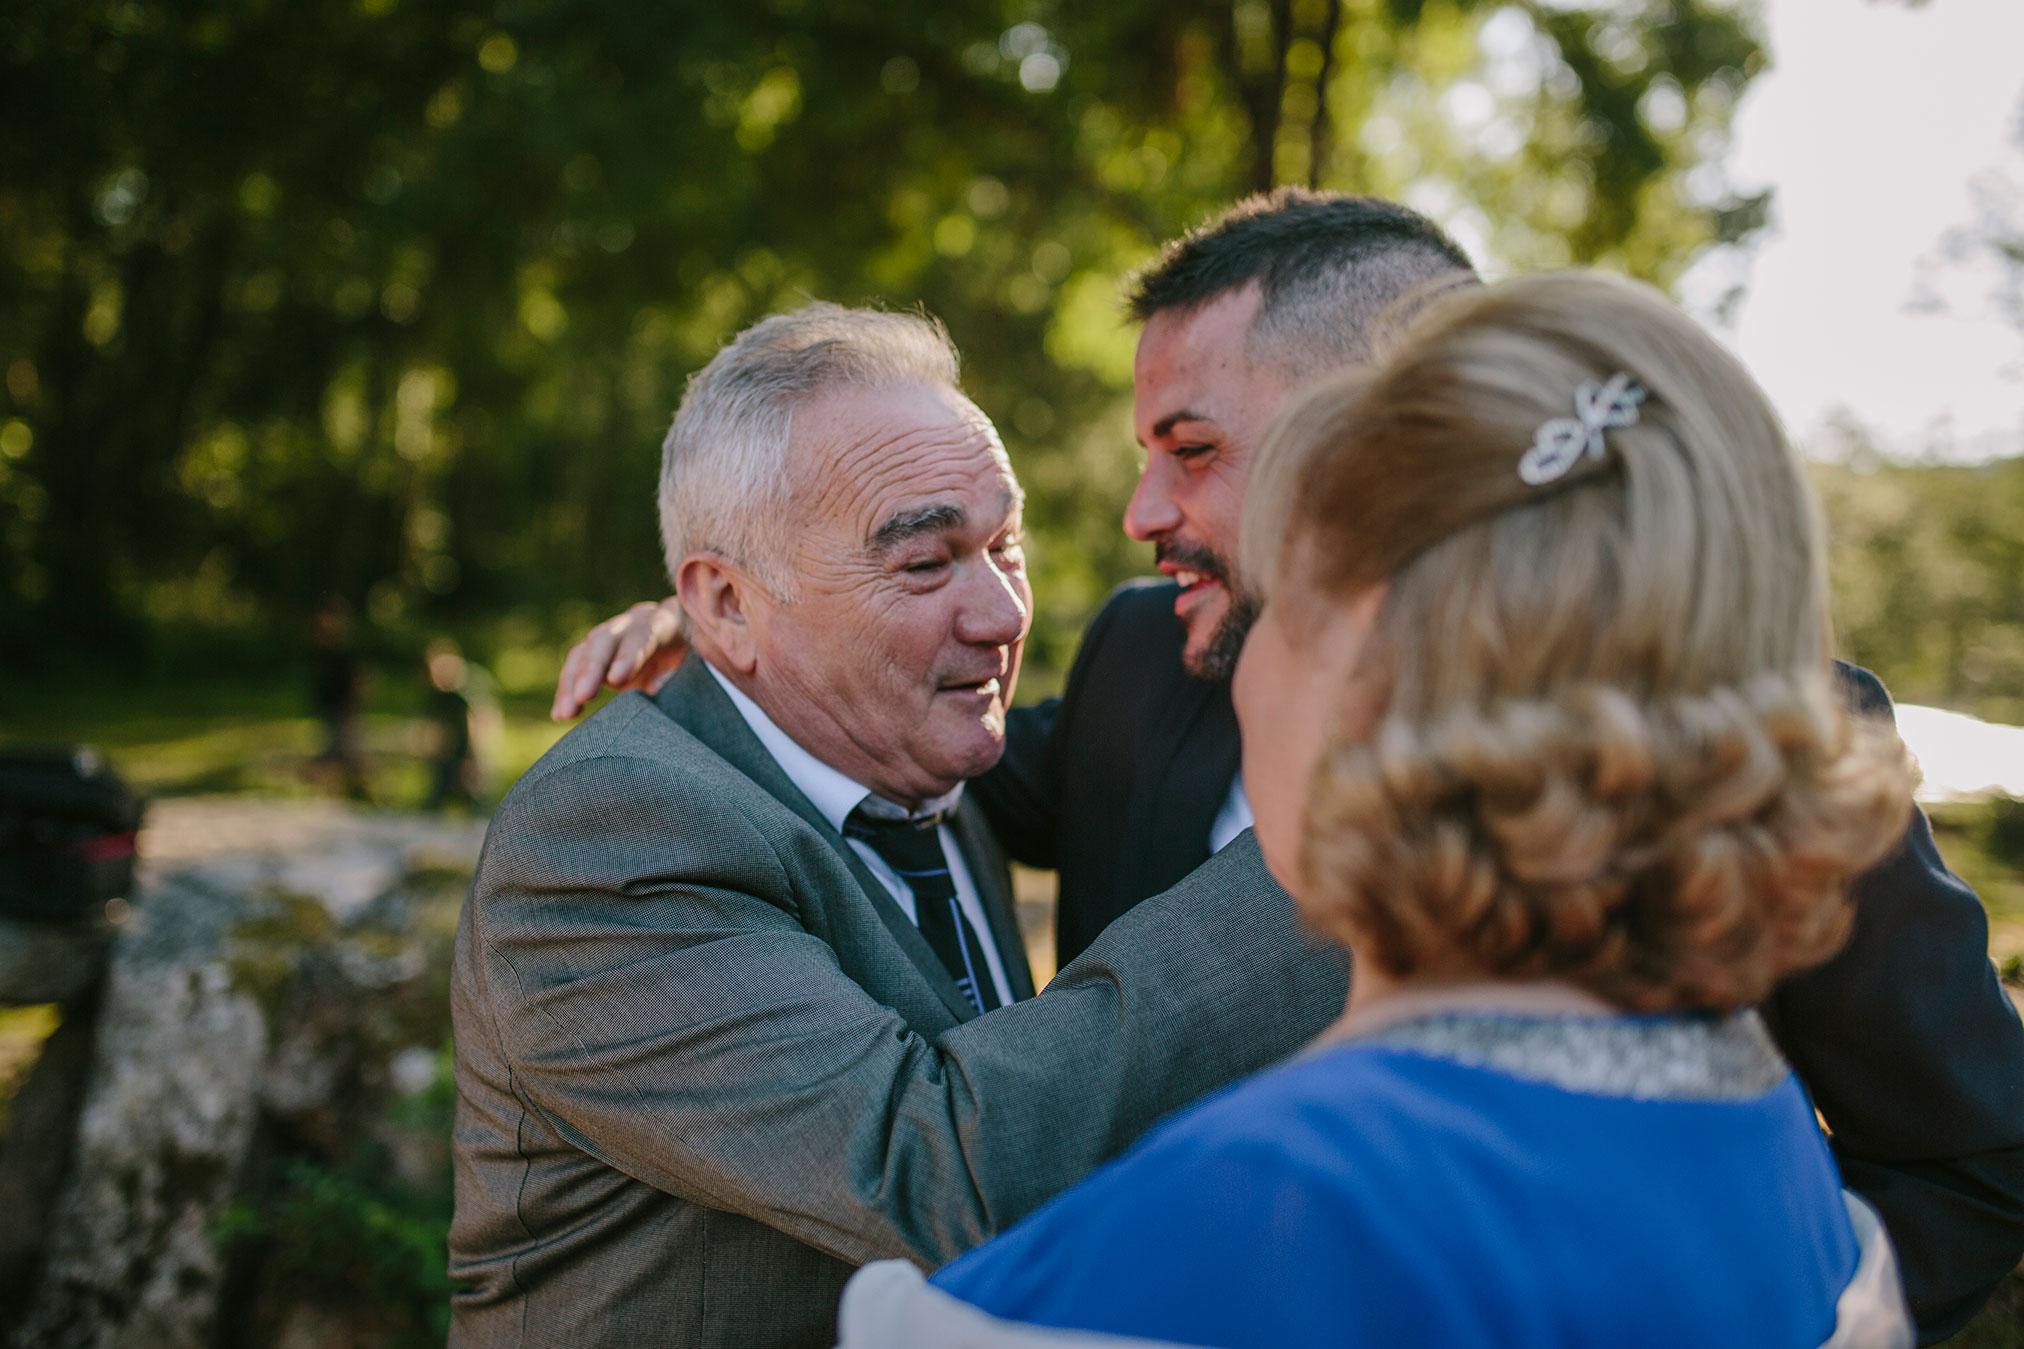 Wedding Photographer Graciela Vilagudin Dublin Galicia 834.jpg